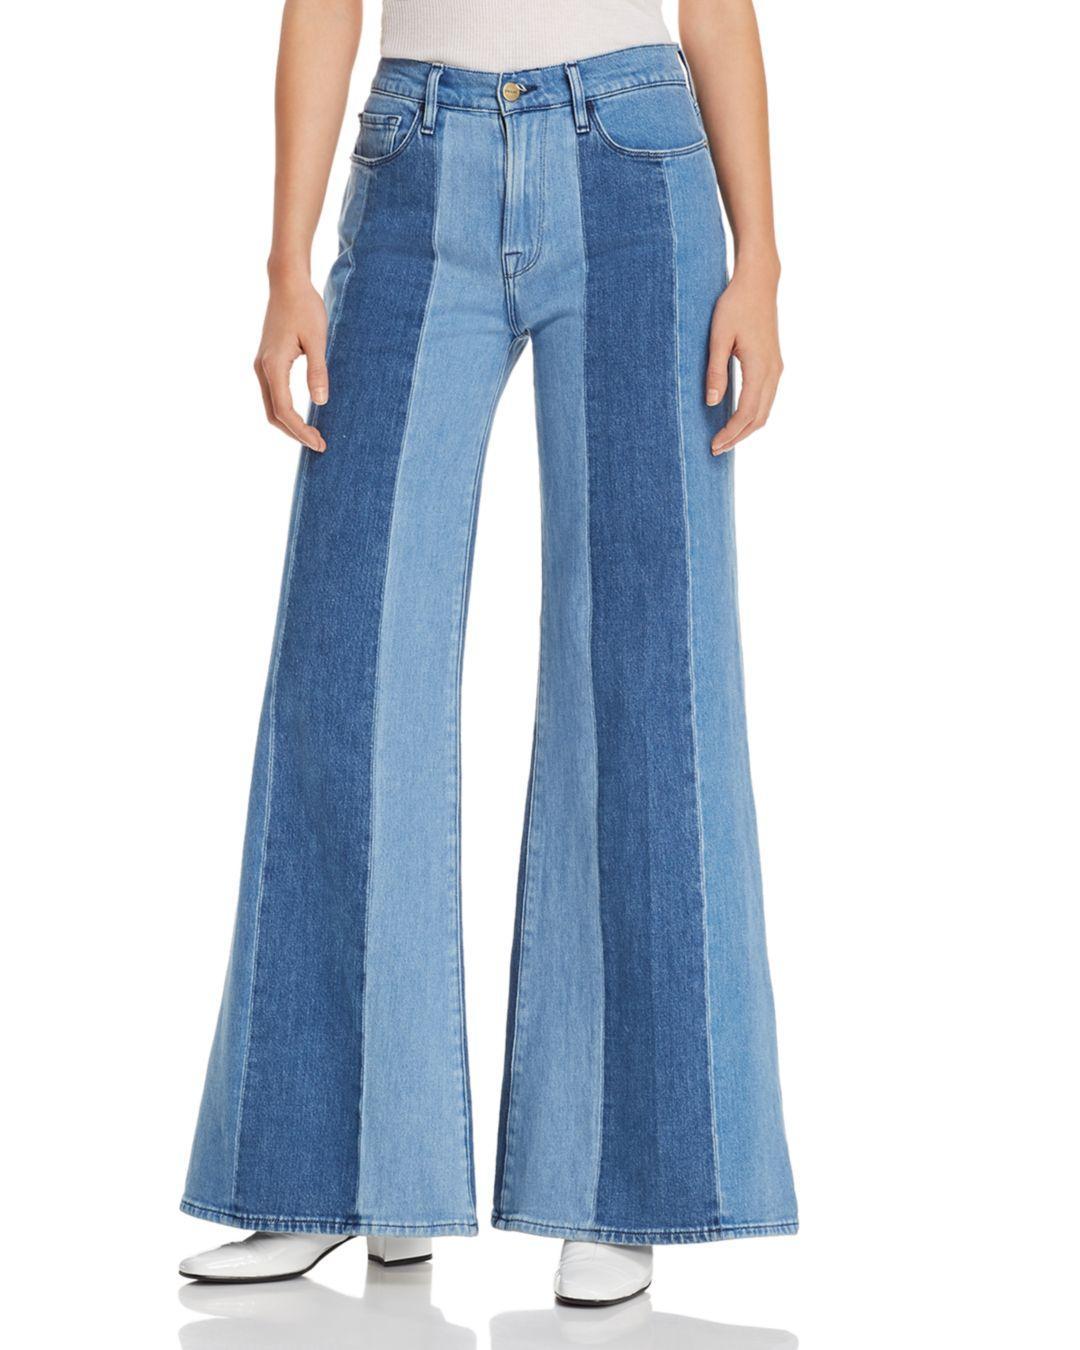 baa78b94d1 Lyst - FRAME Le Palazzo Paneled Wide-leg Jeans In Vineyard in Blue ...